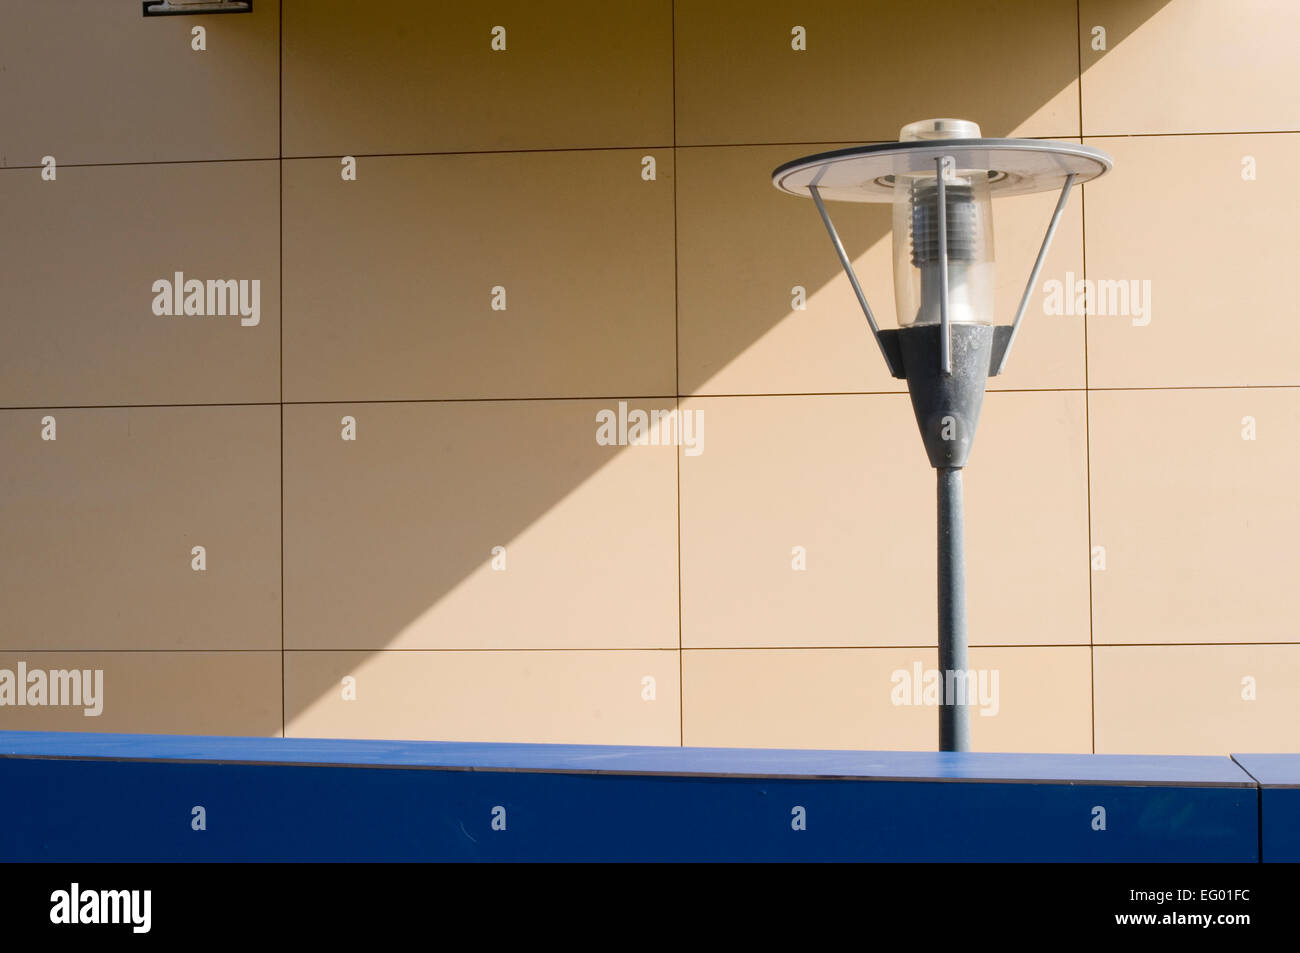 street light lighting contemporary furniture modern design designs uplighter up lighter - Stock Image